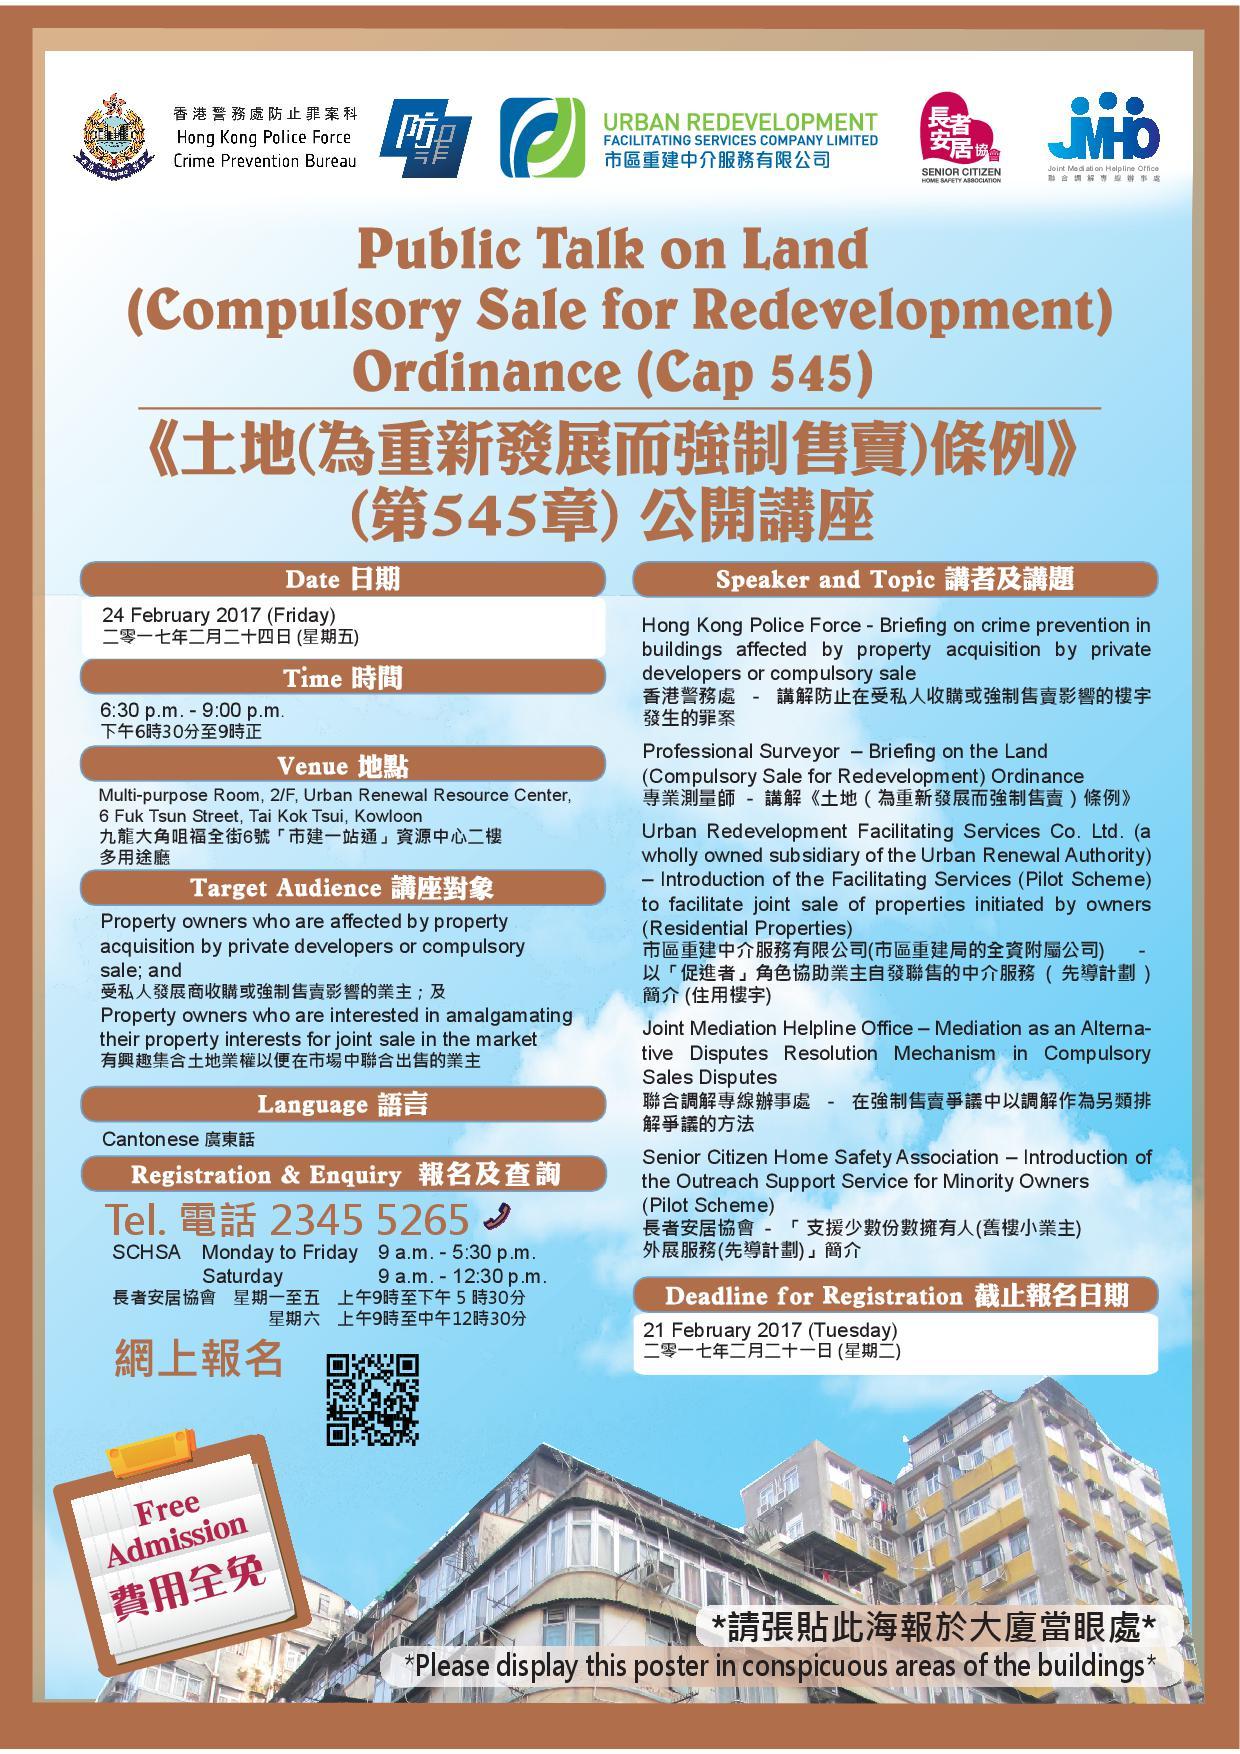 24 Feb 2017, Public Talk on Land (Compulsory Sale for Redevelopment)  Ordinance (Cap 545)